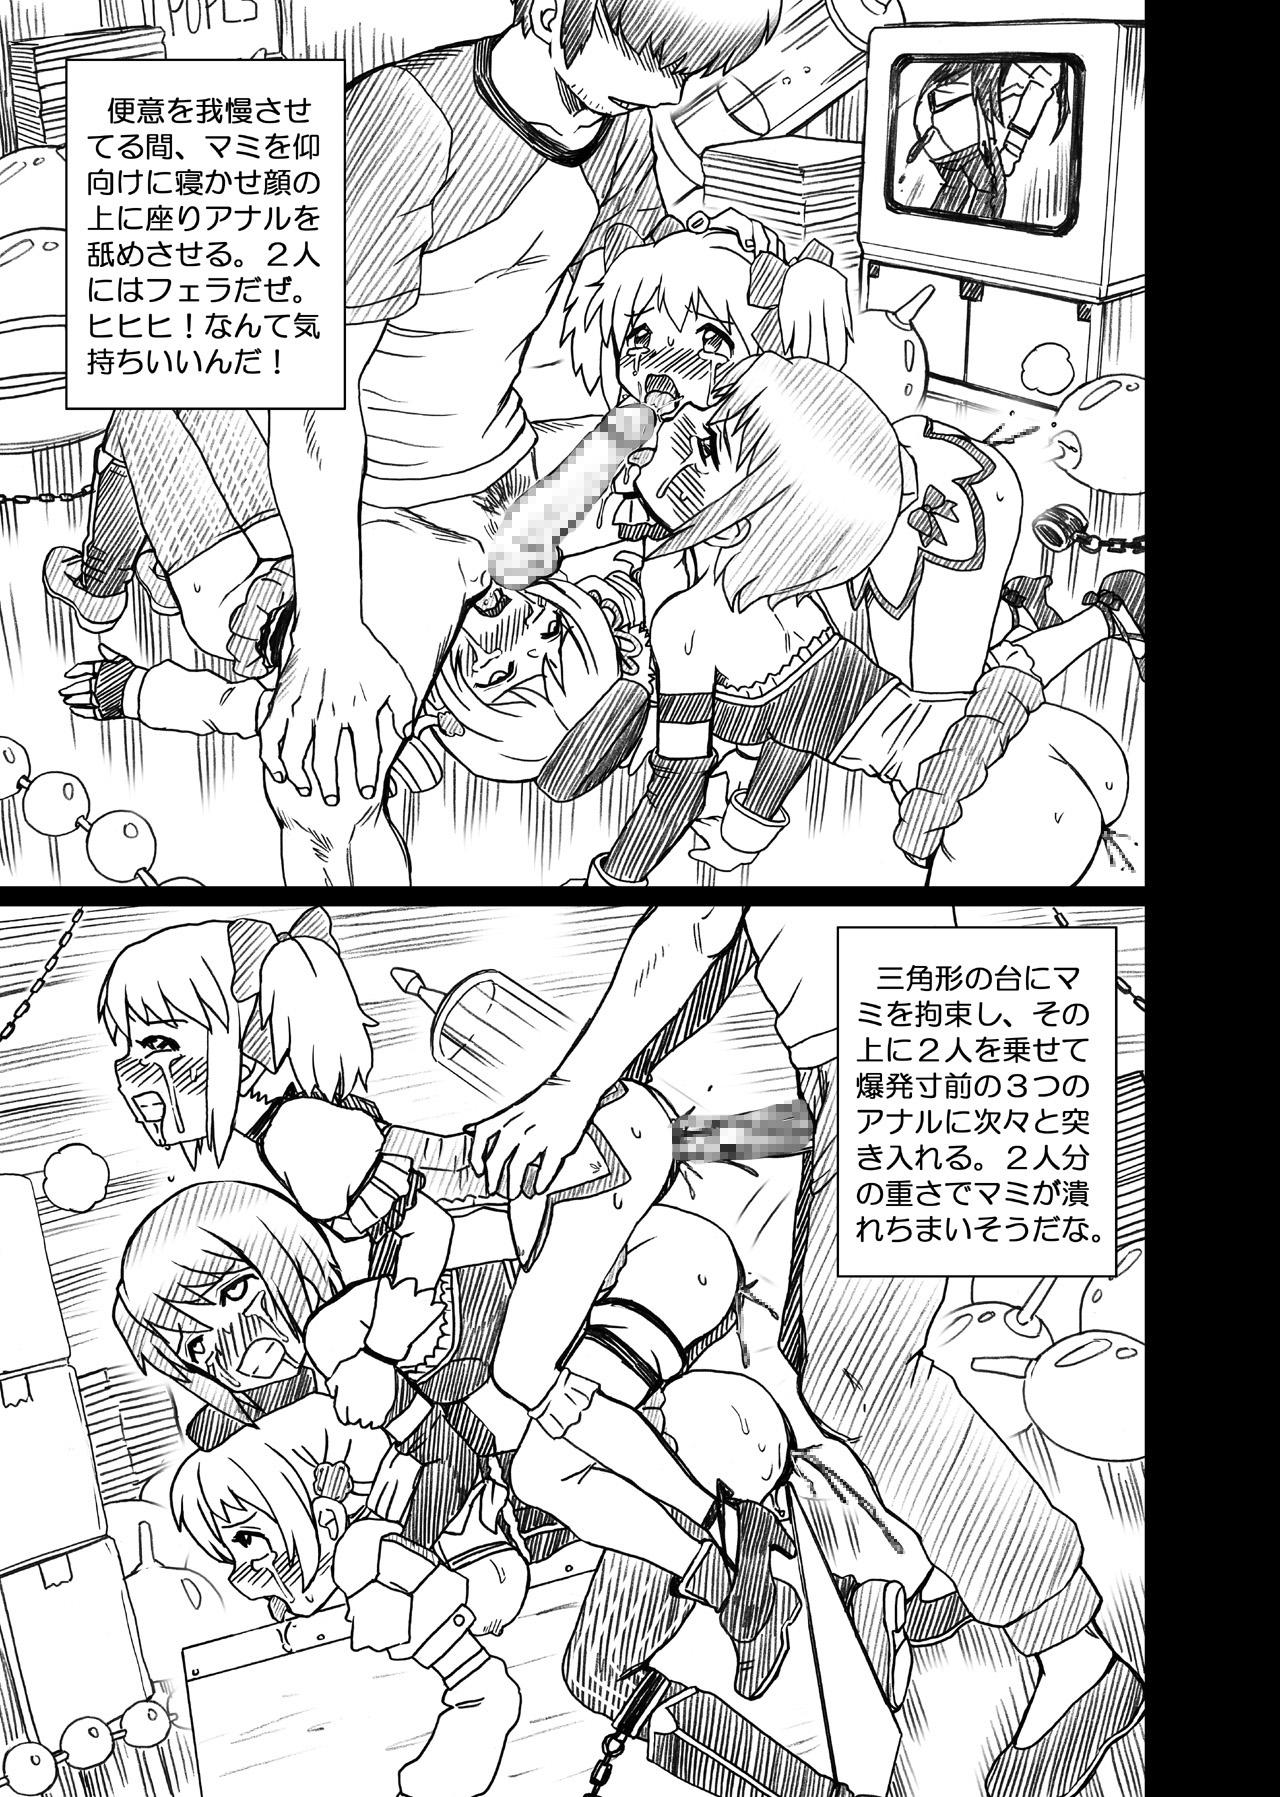 """Mado★Magi"" Anal & Scatolo Sakuhinshuu 50"